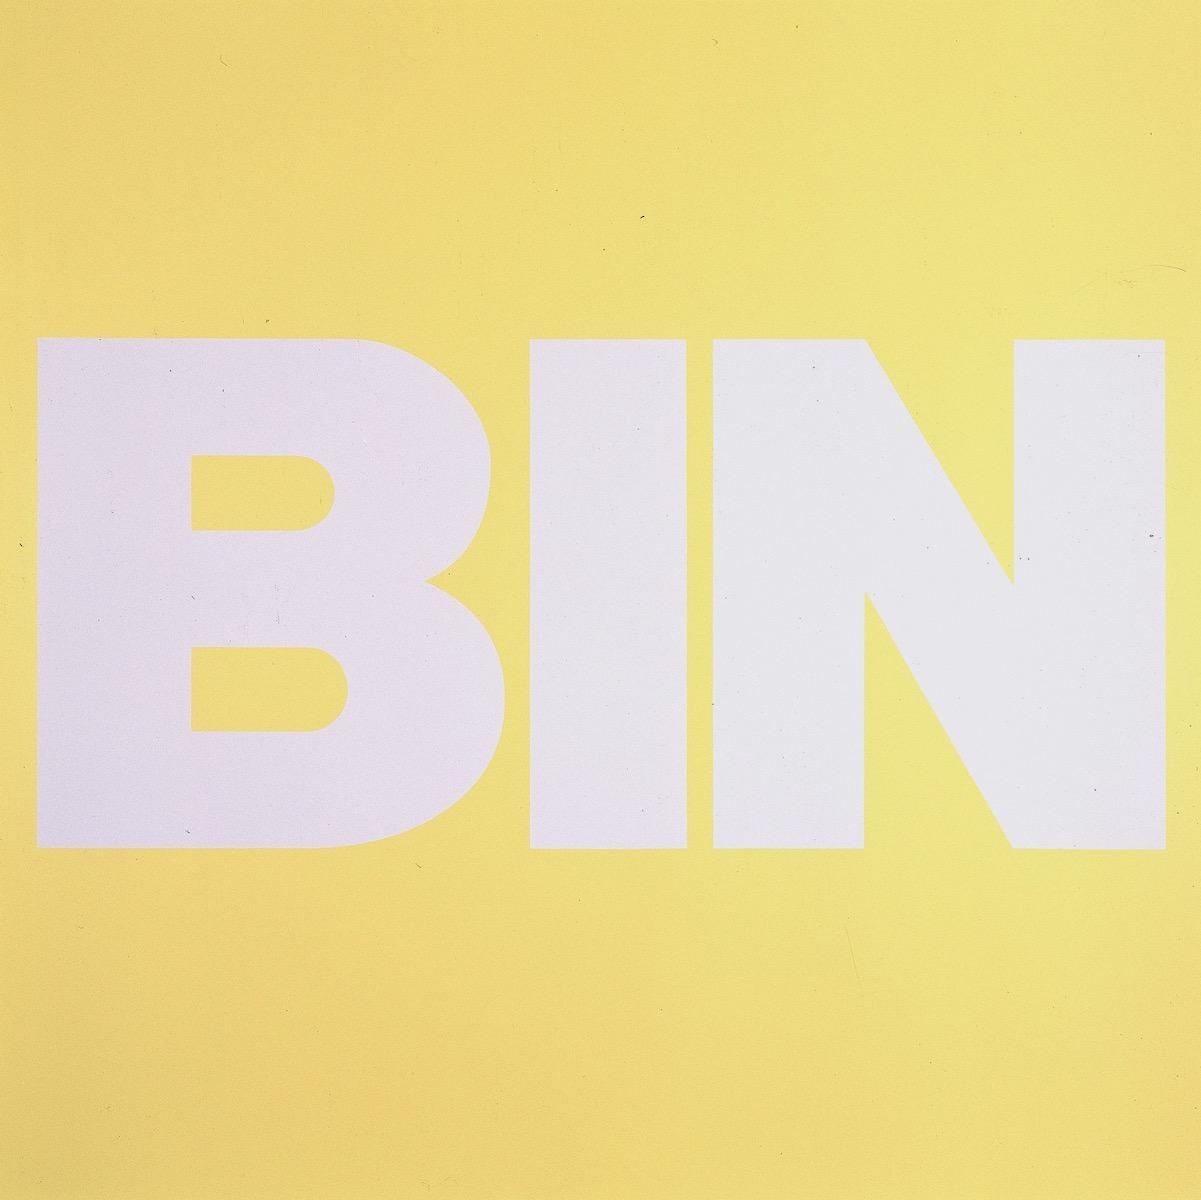 BIN, GELB | Affirmation tut gut | Angelika Beuler | 1992